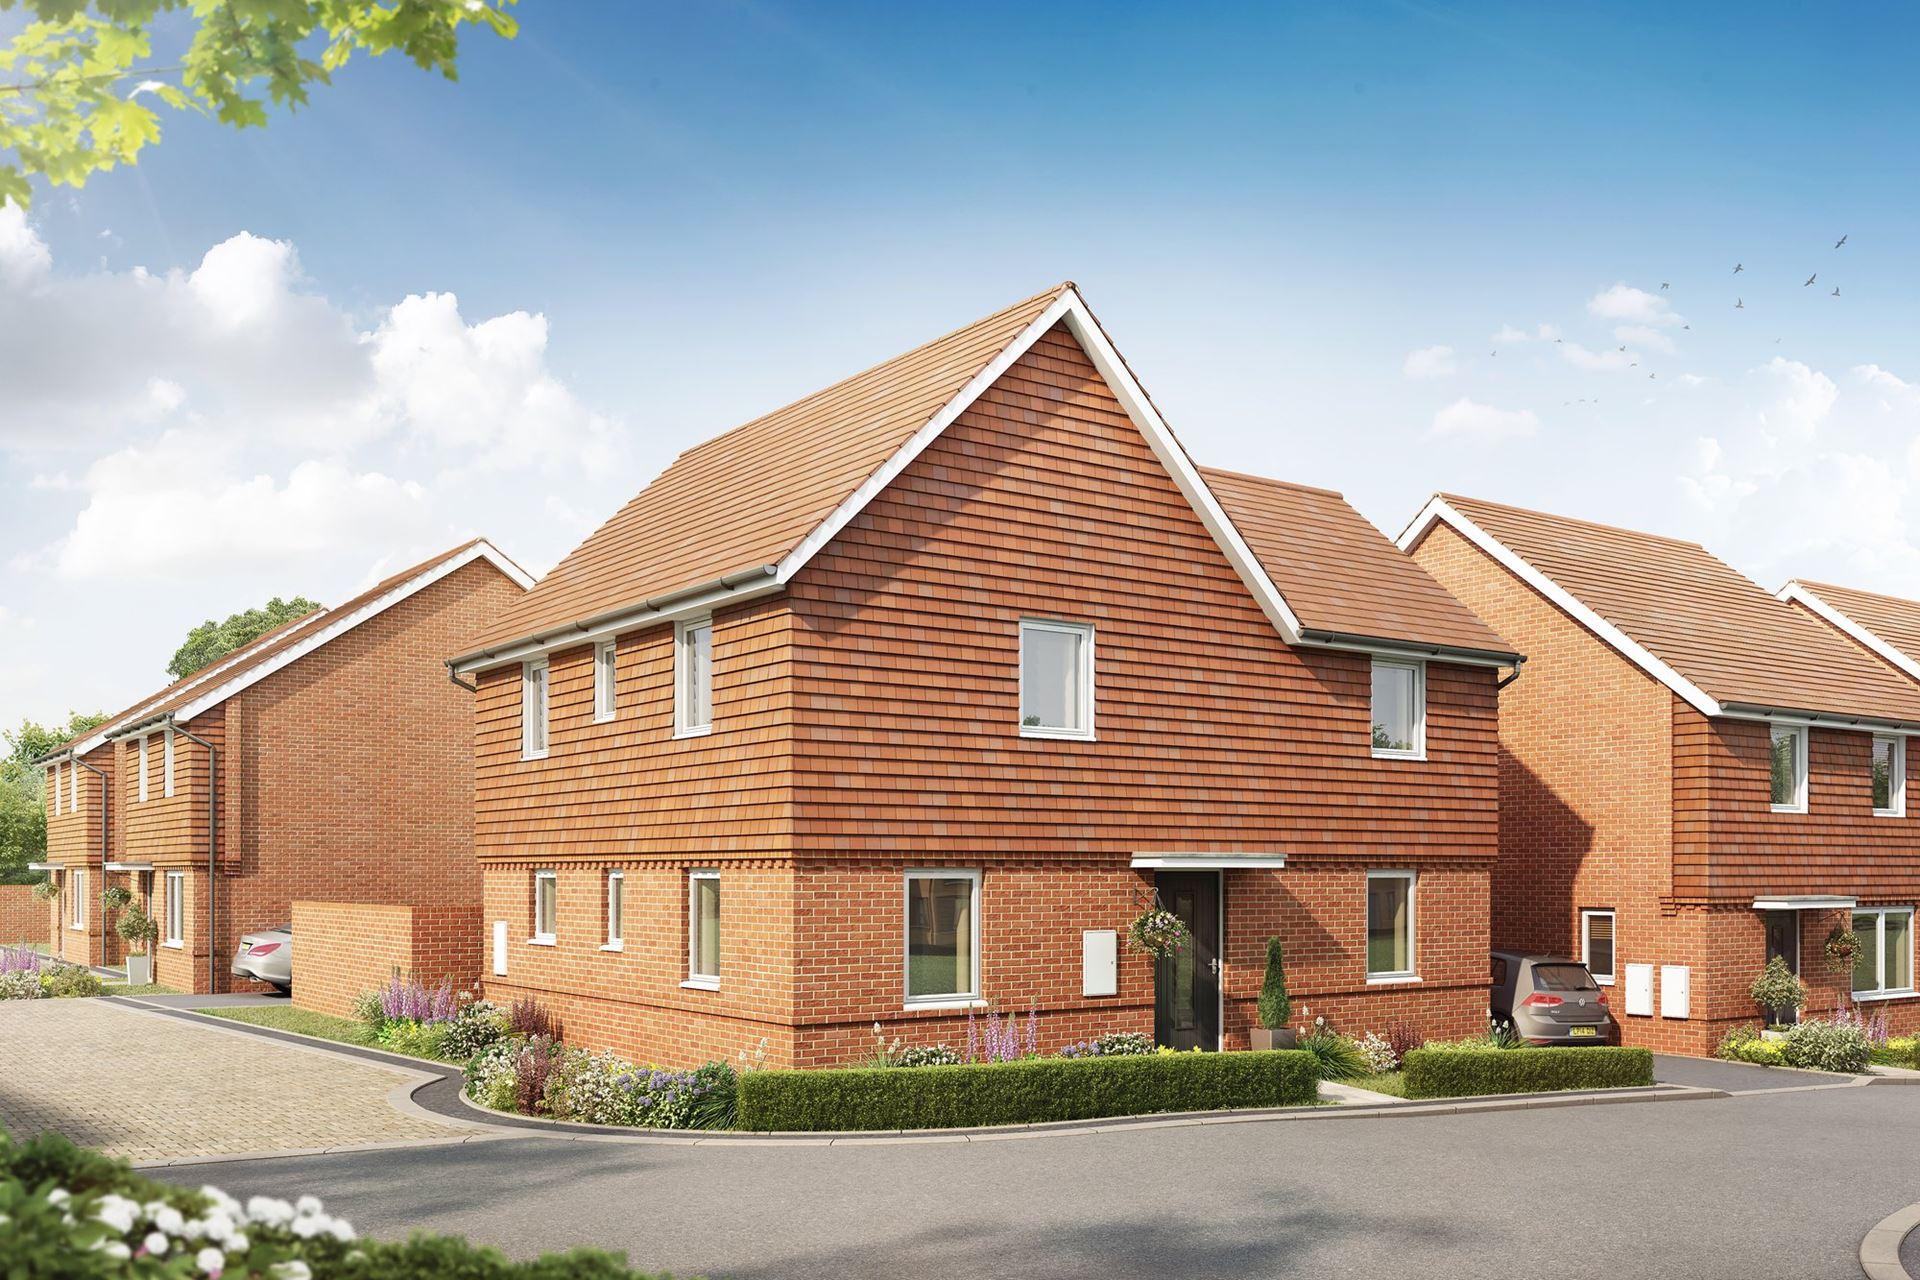 New Build Homes in Basingstoke